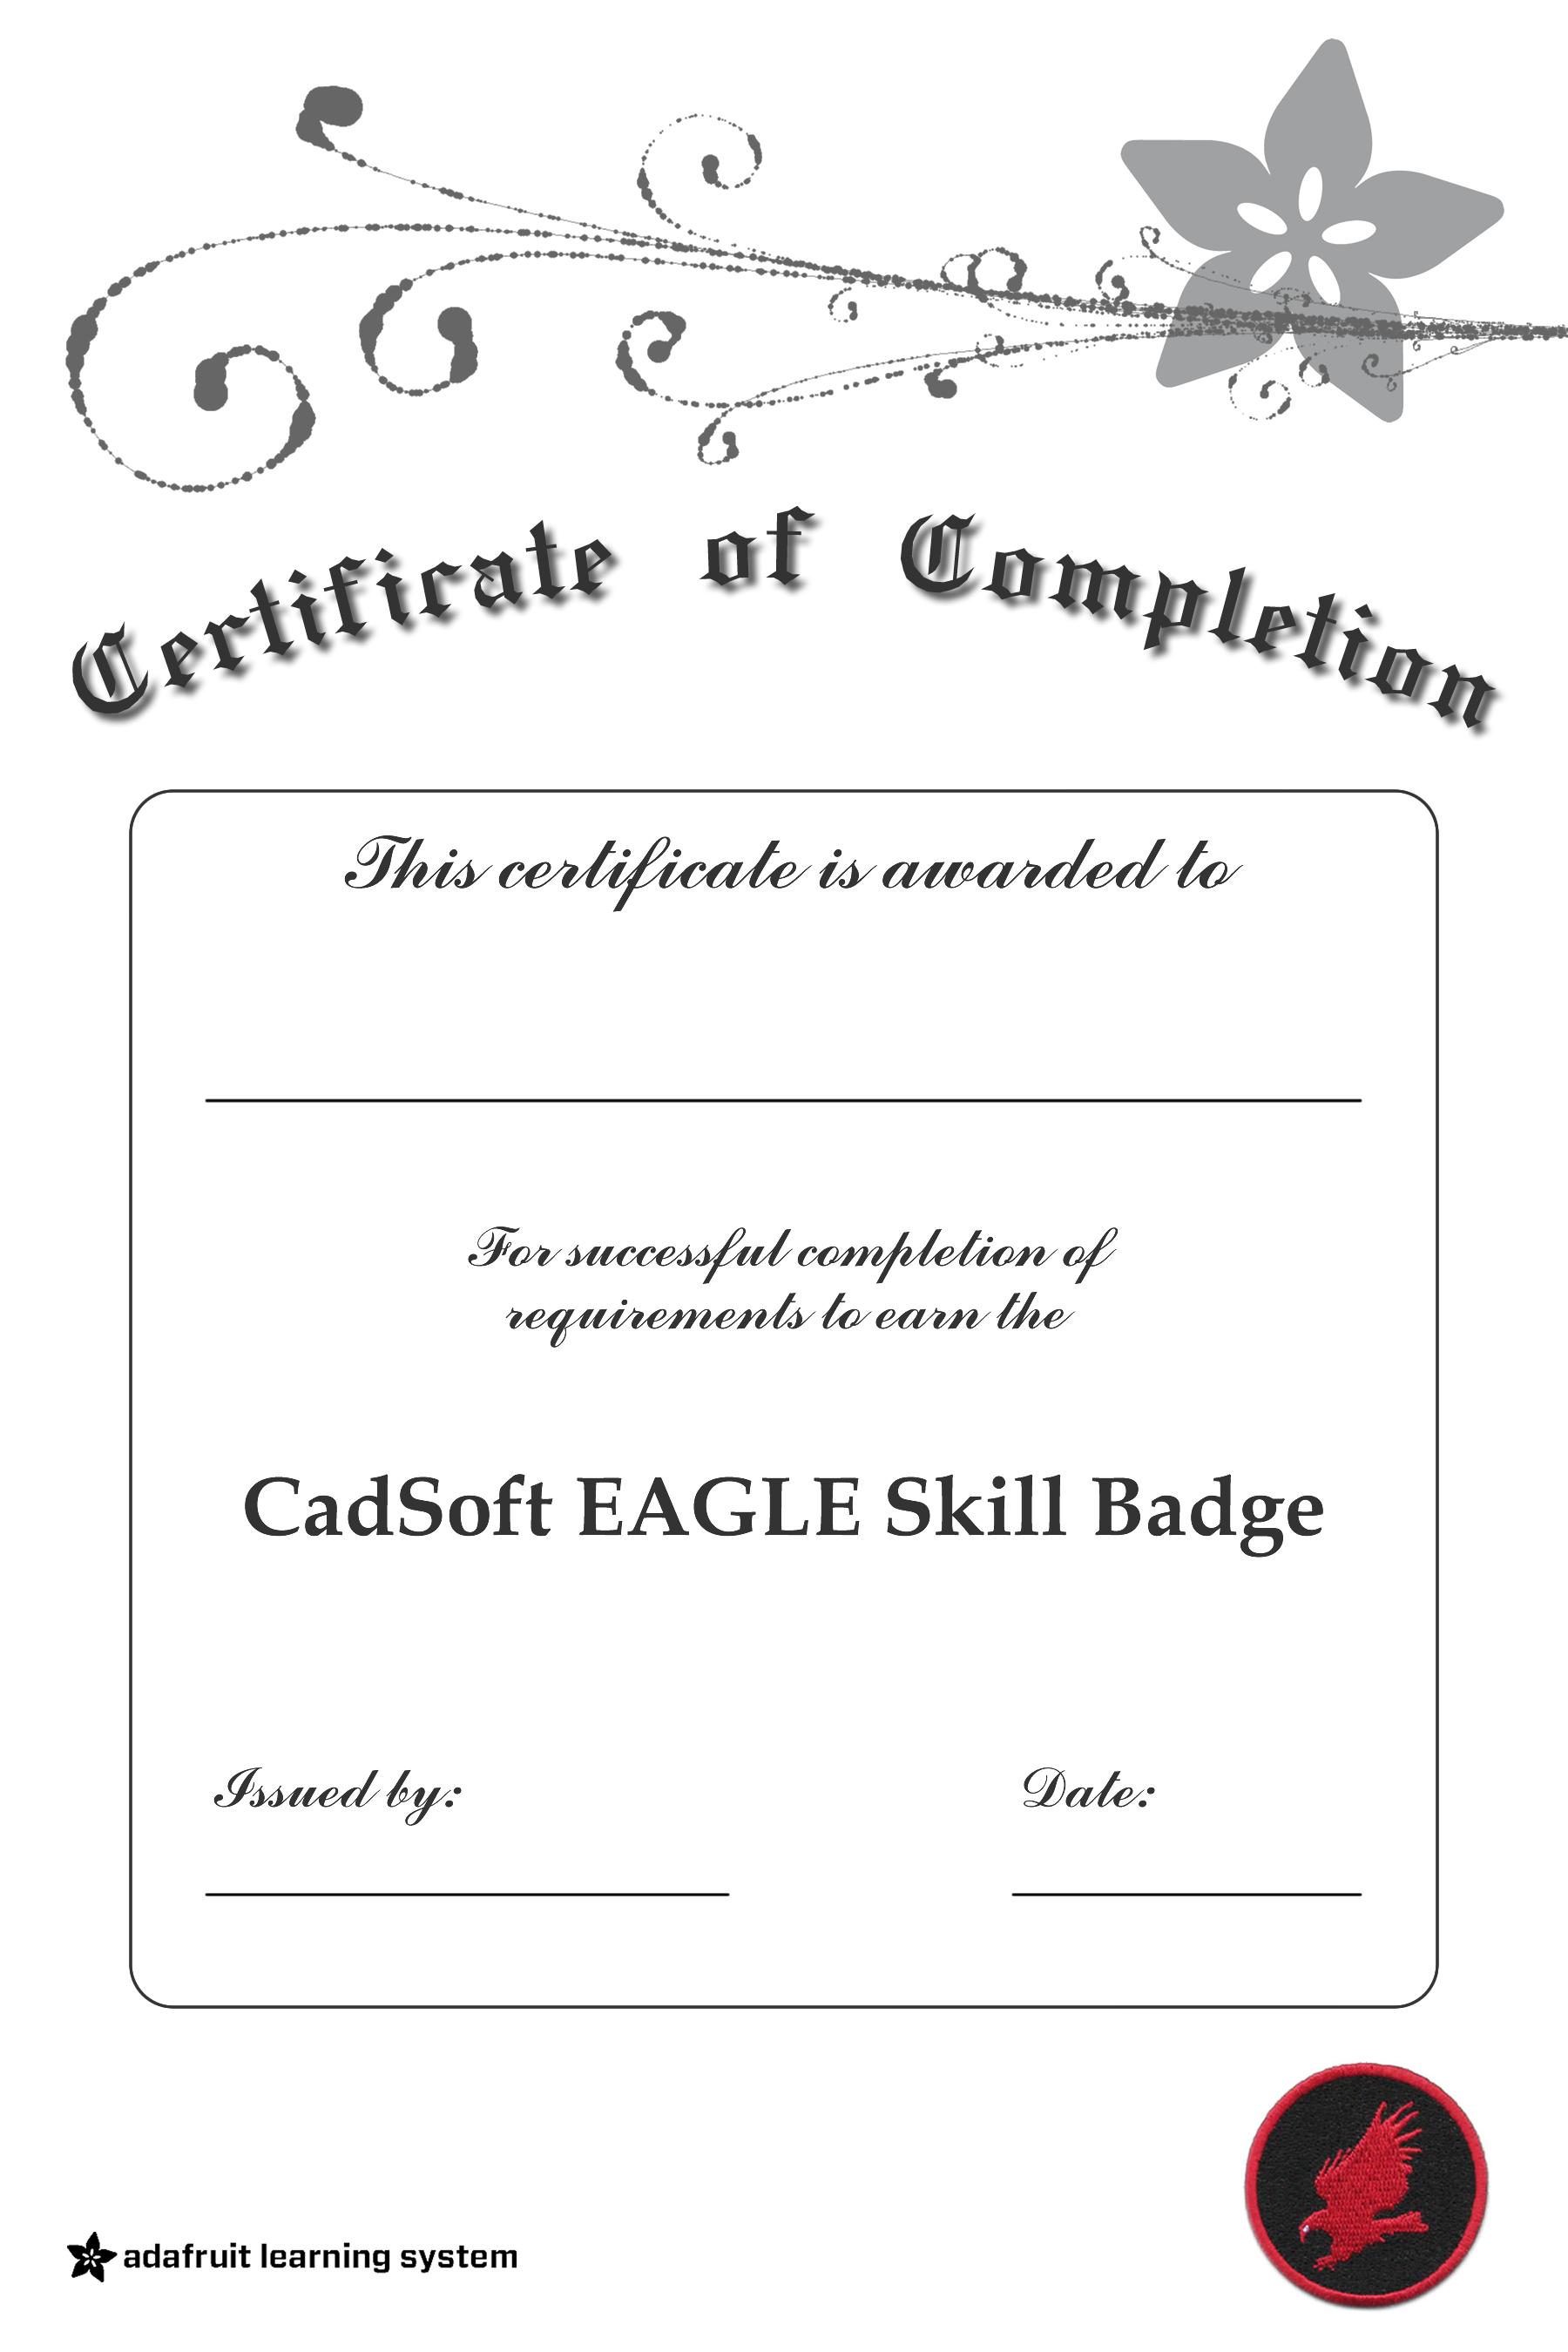 braincrafts_EAGLE_-_certificate.png